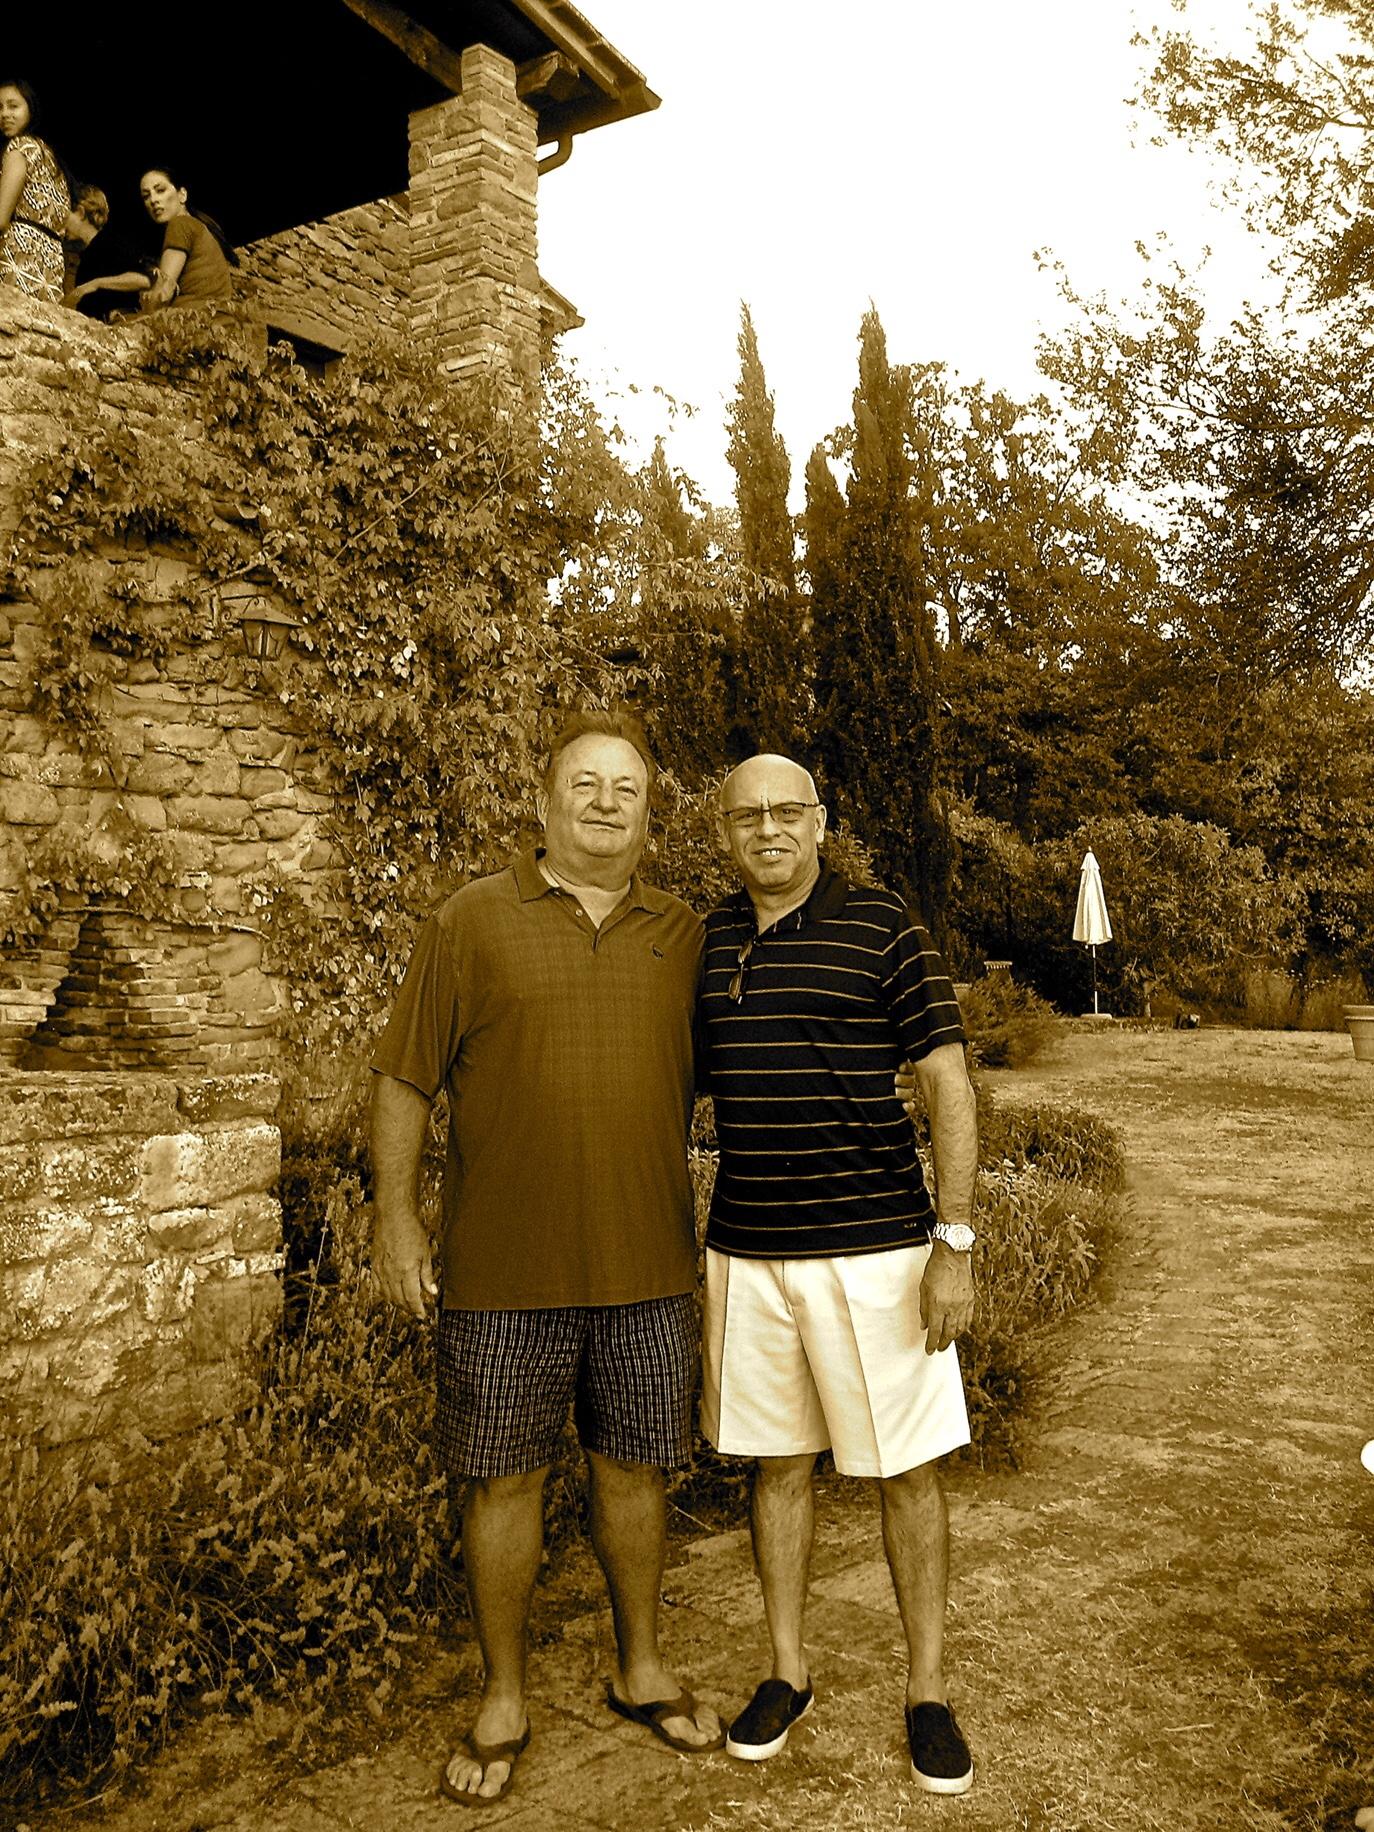 Larry Peery and MC in Umbria, Italy 2012